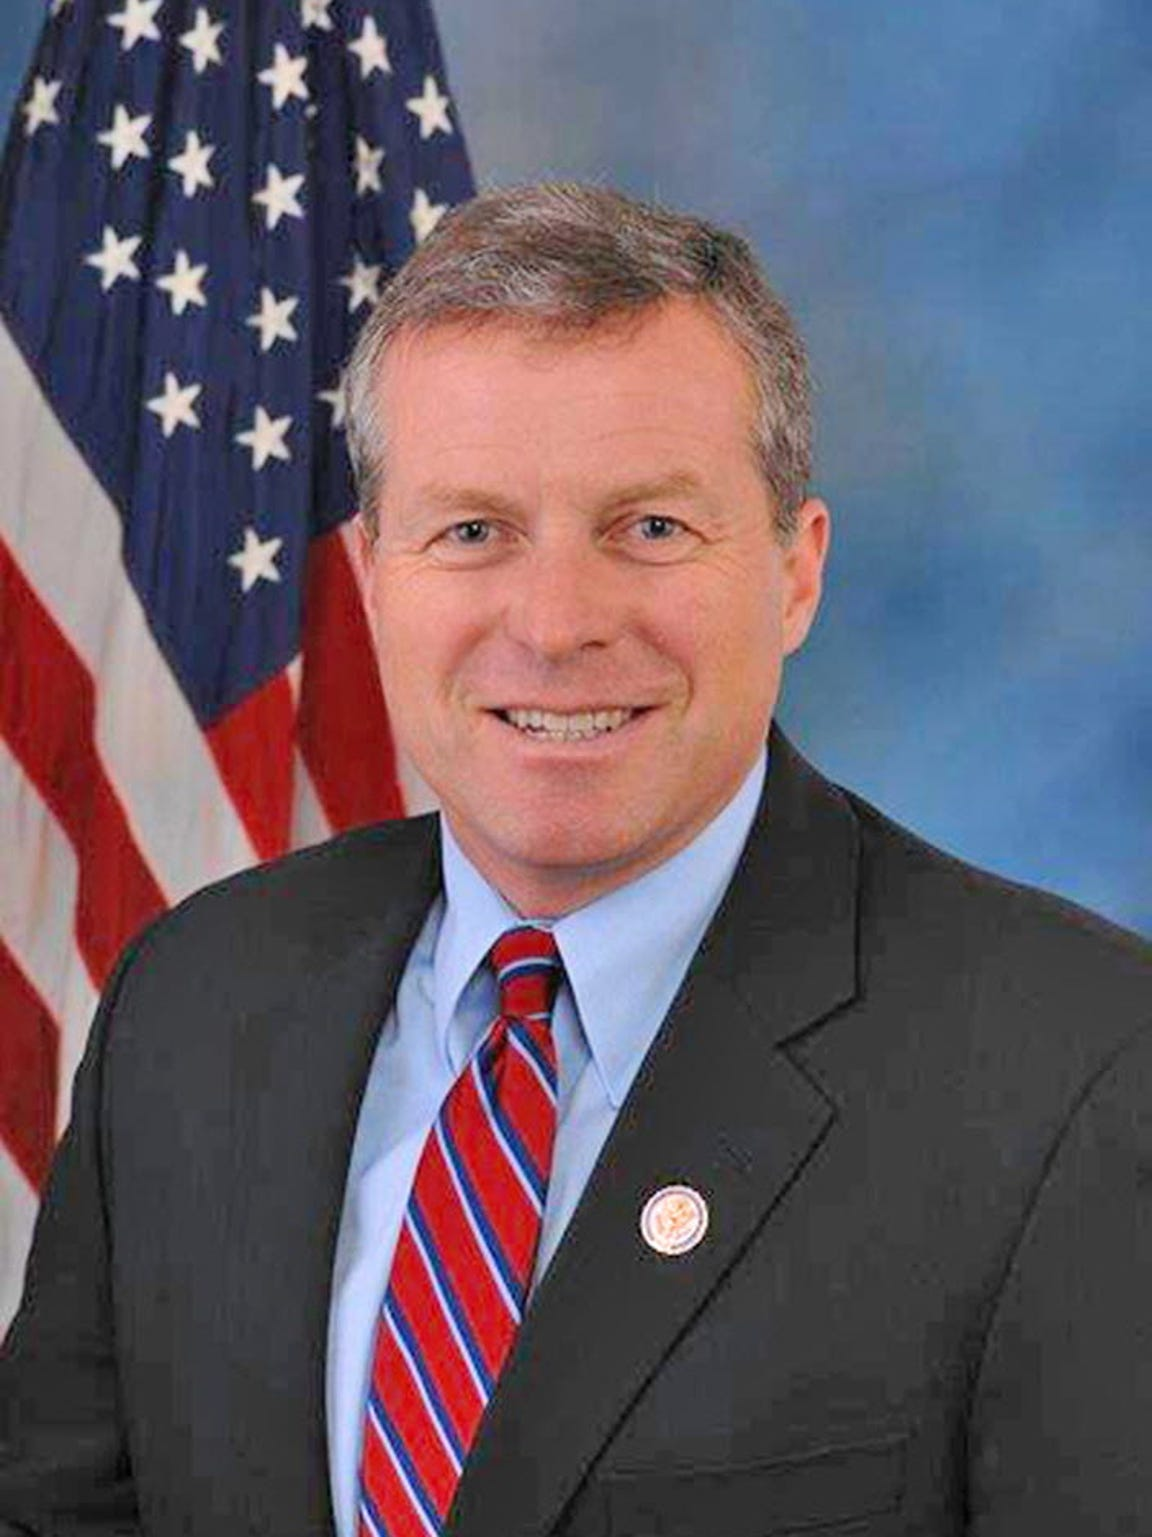 Rep. Charlie Dent, Pennsylvania's 15th Congressional